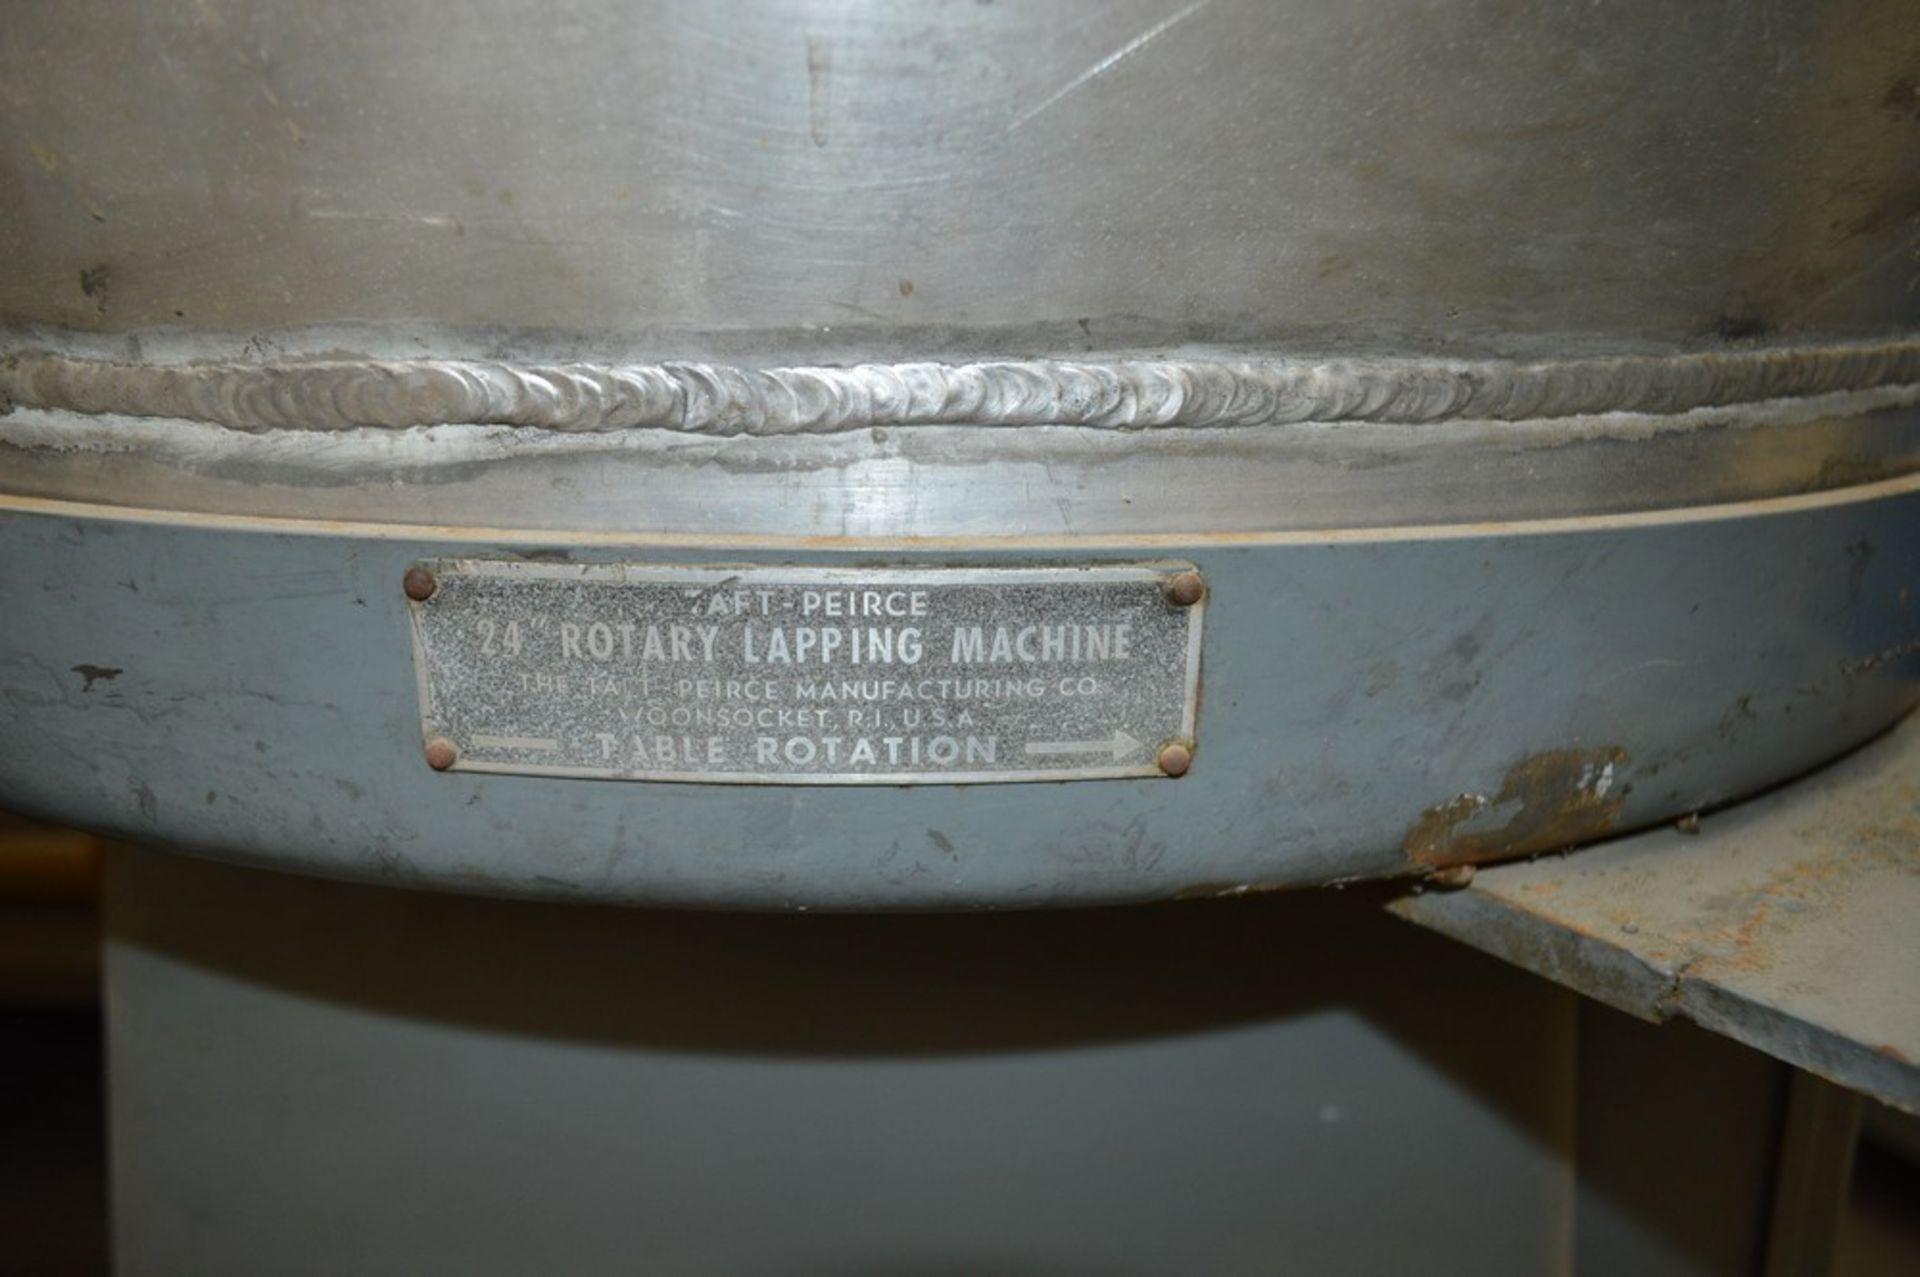 "Taft-Peirce 24"" Rotary Lapping machine S/N 217 - Image 3 of 4"